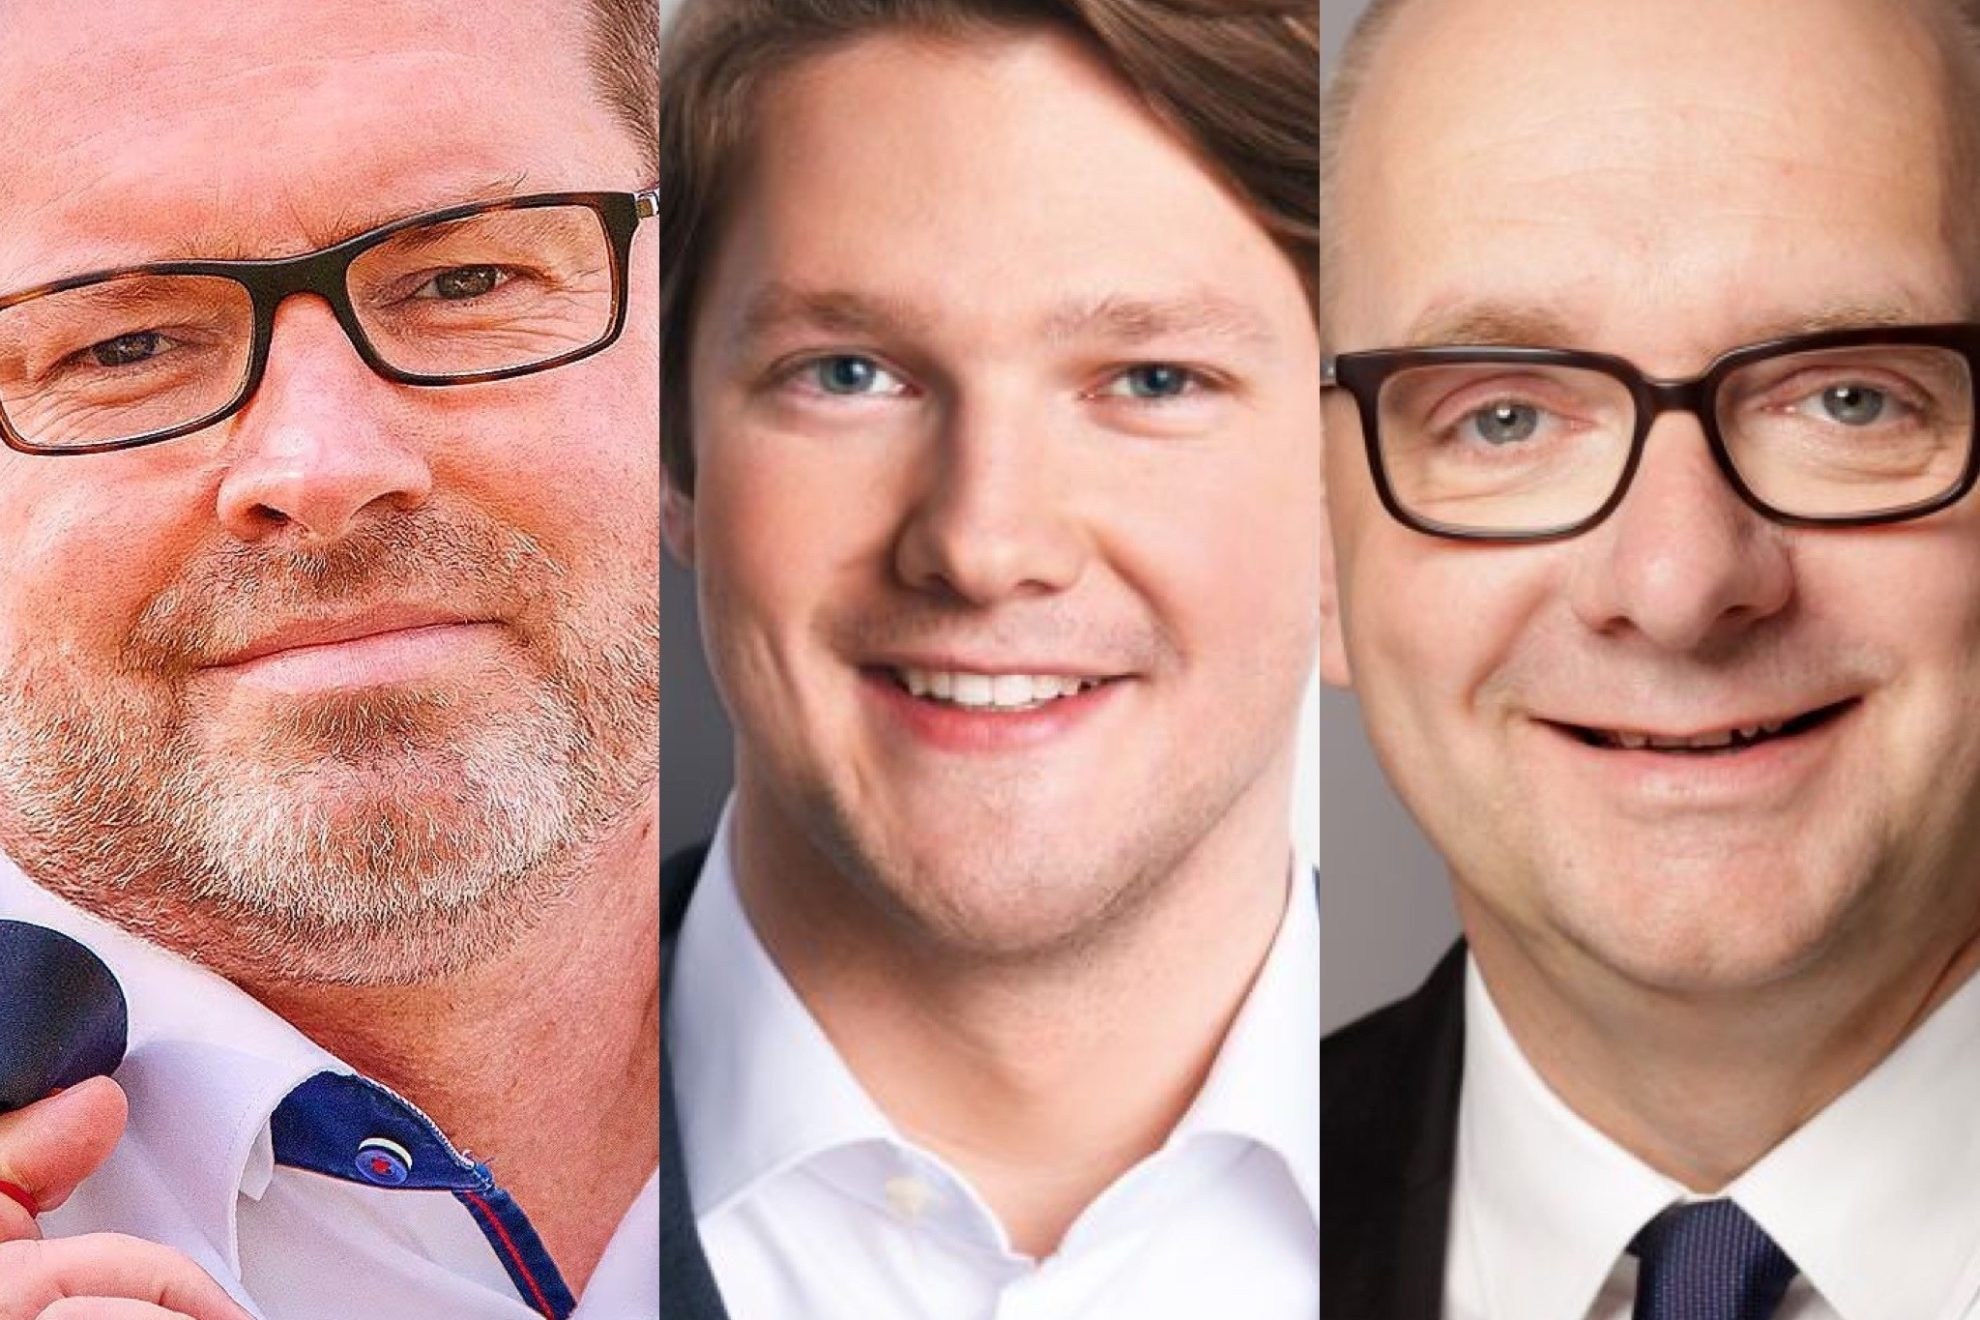 Jürgen Coße, Robert von Olberg, Andre Stinka